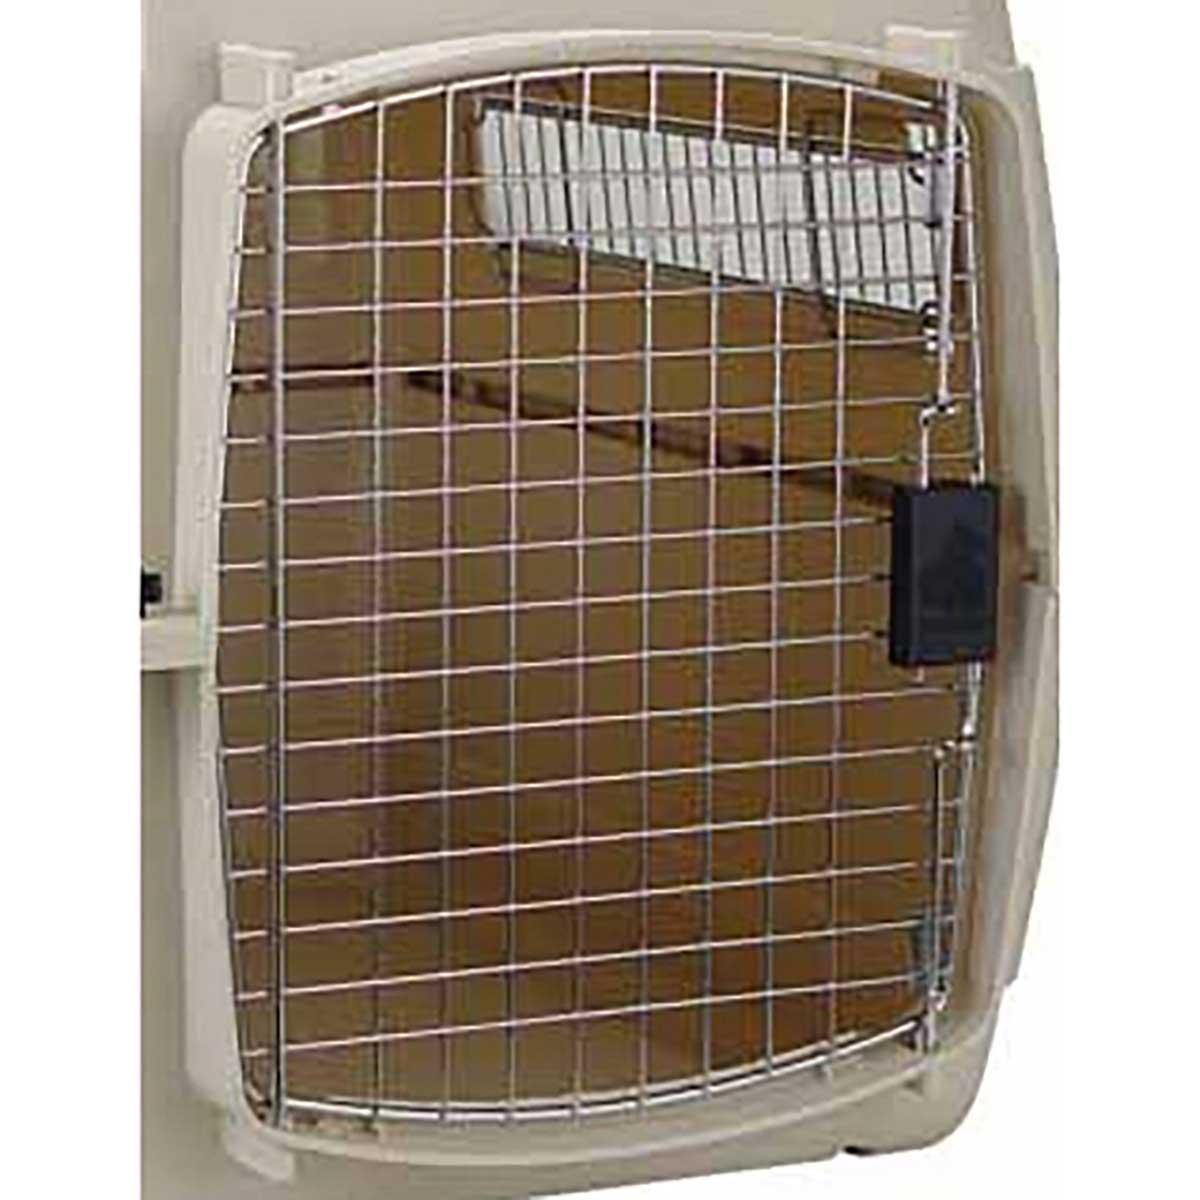 Petmate Ultra Vari Kennel Replacement Door - Intermediate Size